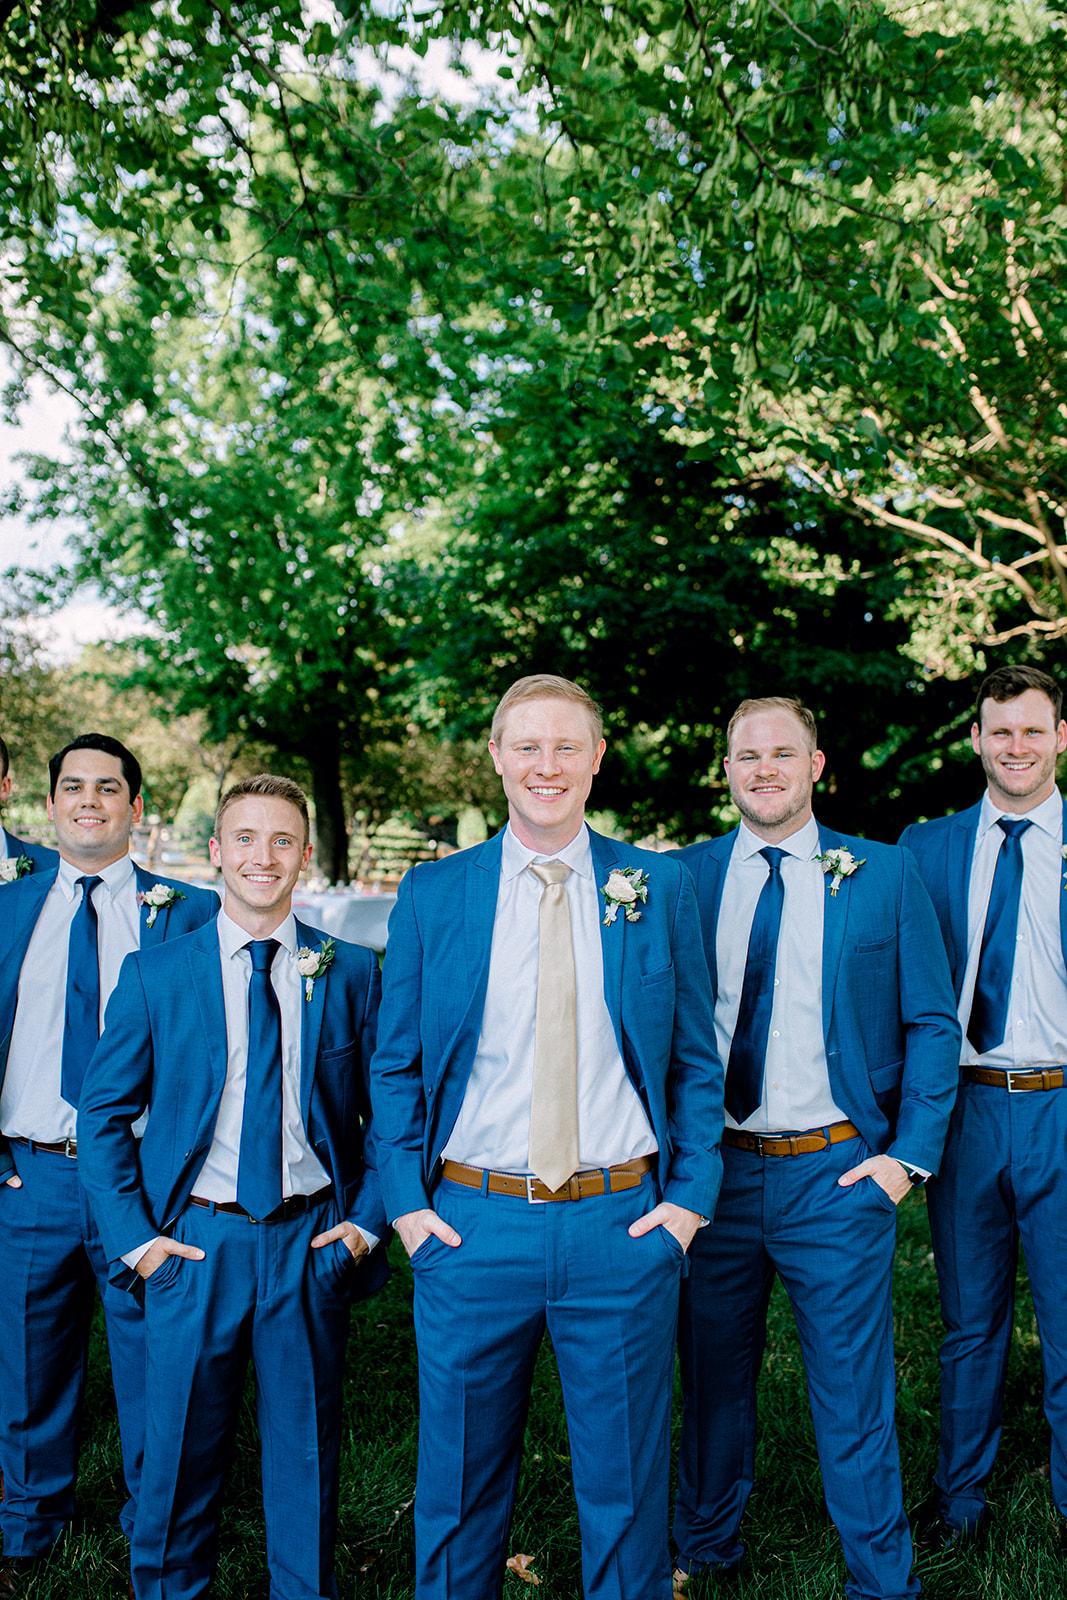 Generation Tux blue wedding tuxedos | Nashville Bride Guide